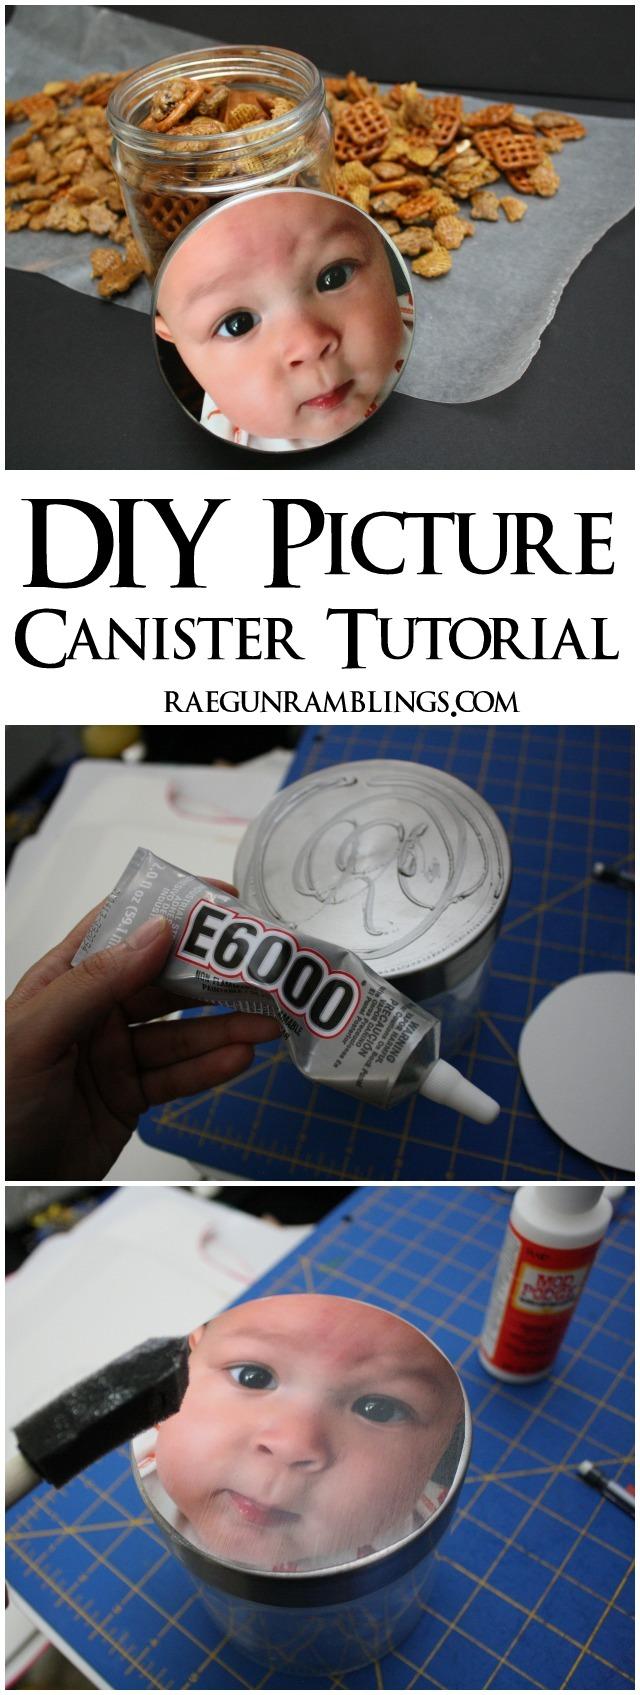 How to make a quick and easy photo jar - Rae Gun Ramblings